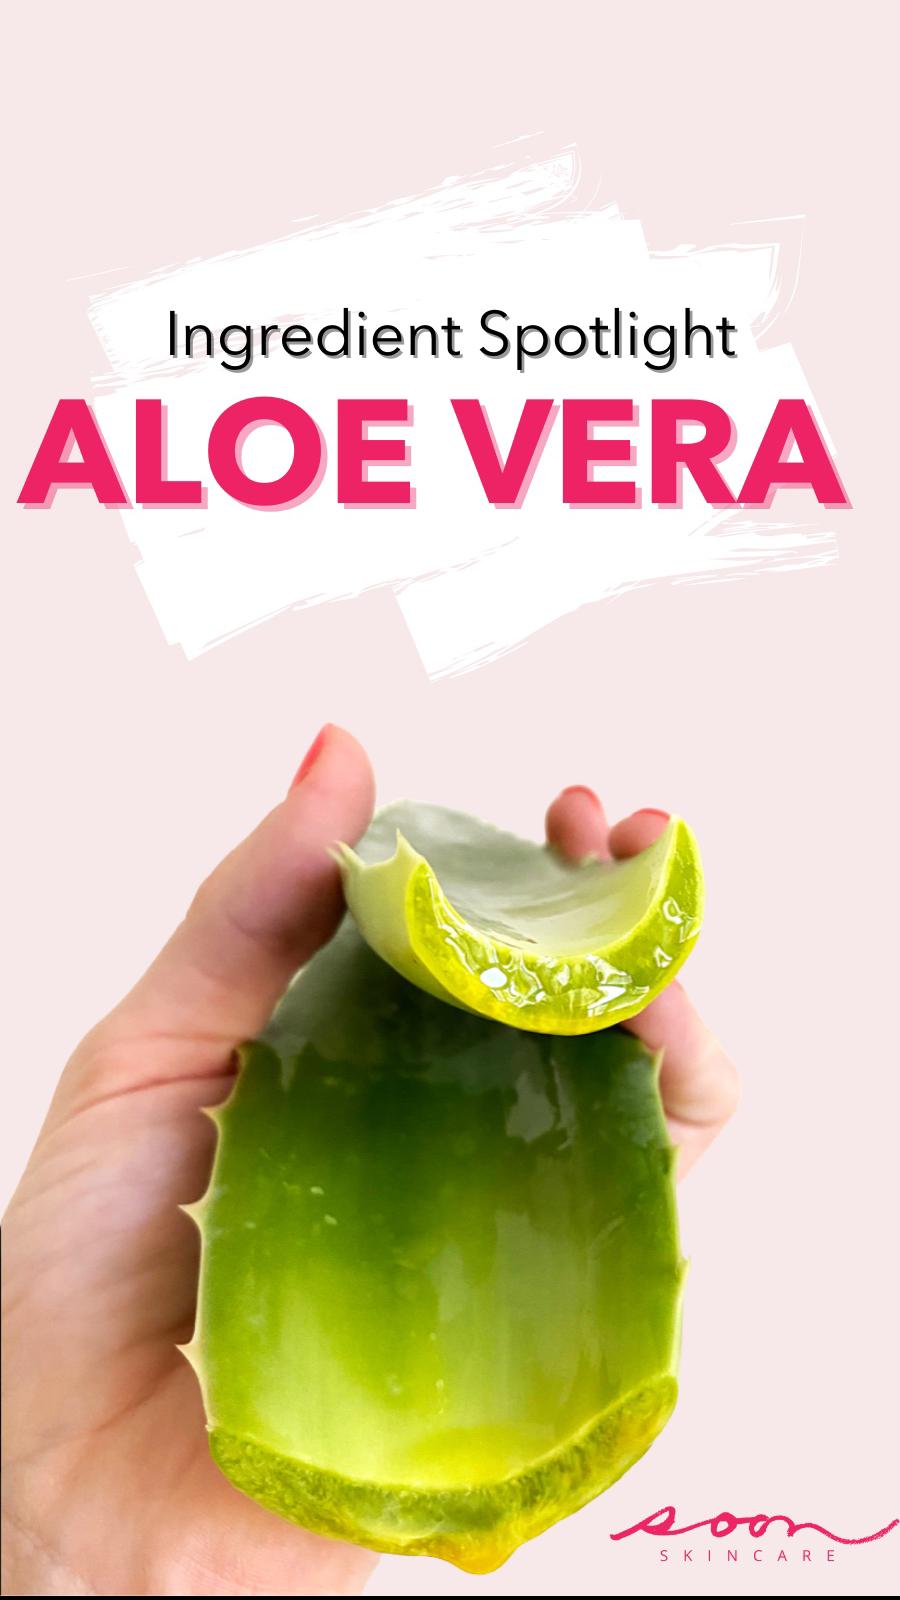 Ingredient Spotlight: Aloe Vera